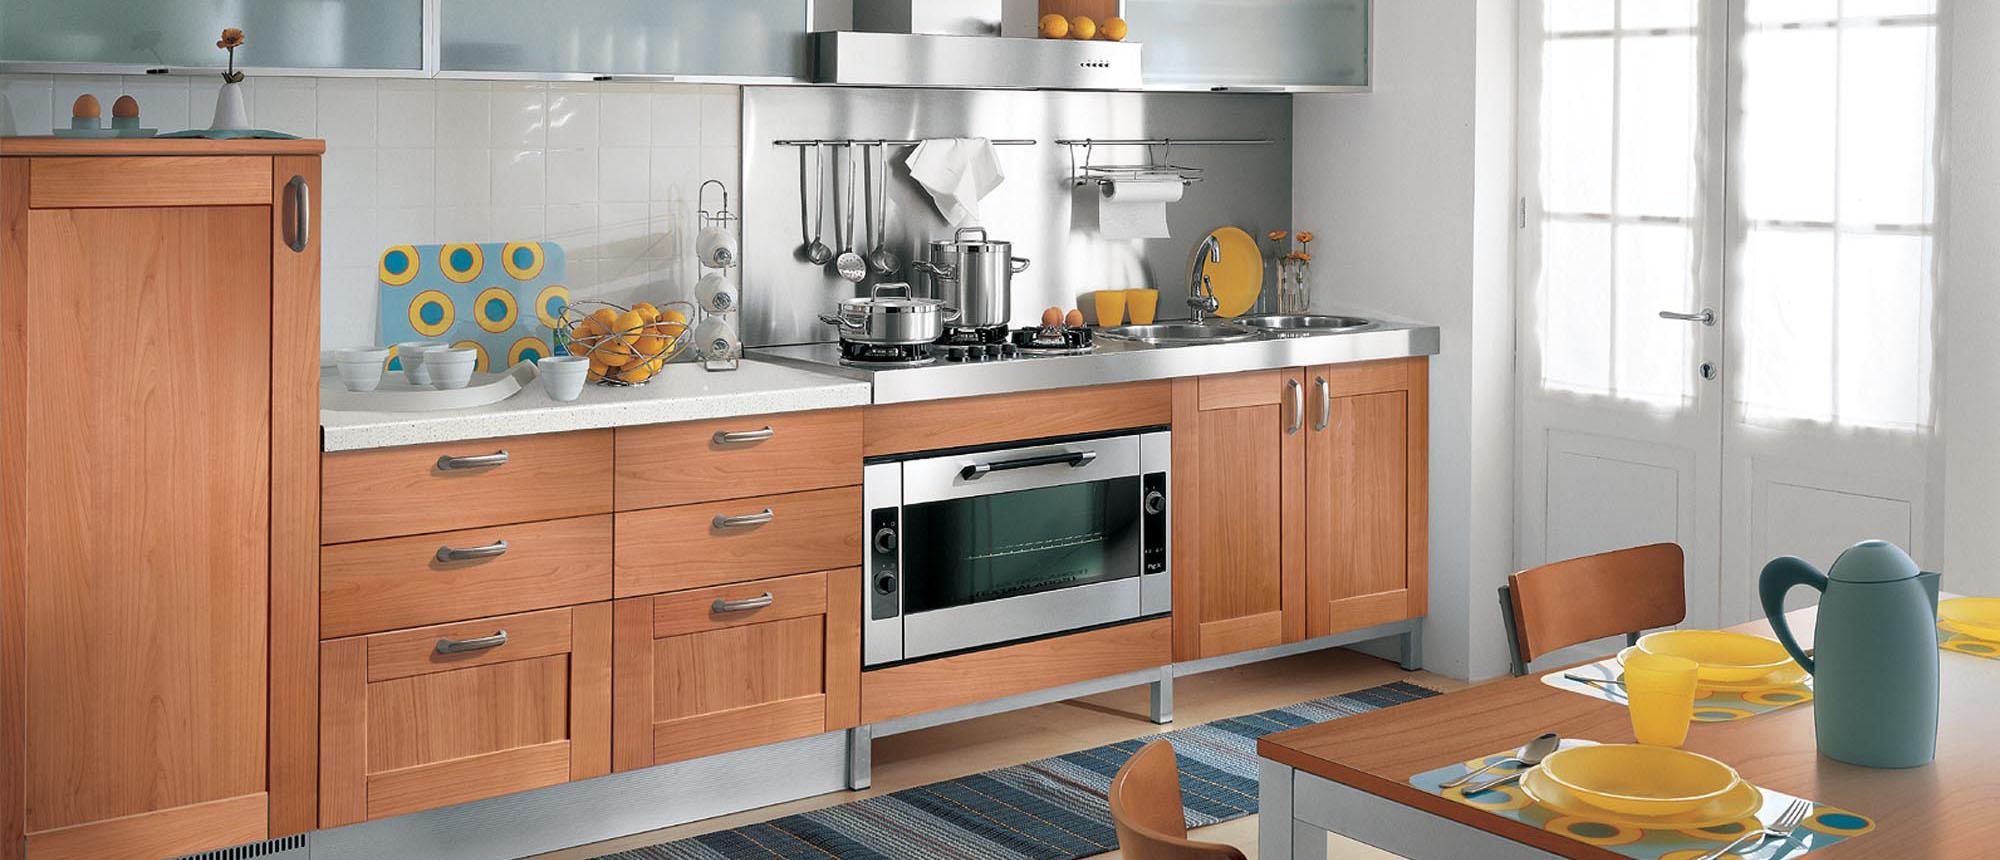 Cucine arredamenti treo - Cucine ciliegio moderne ...